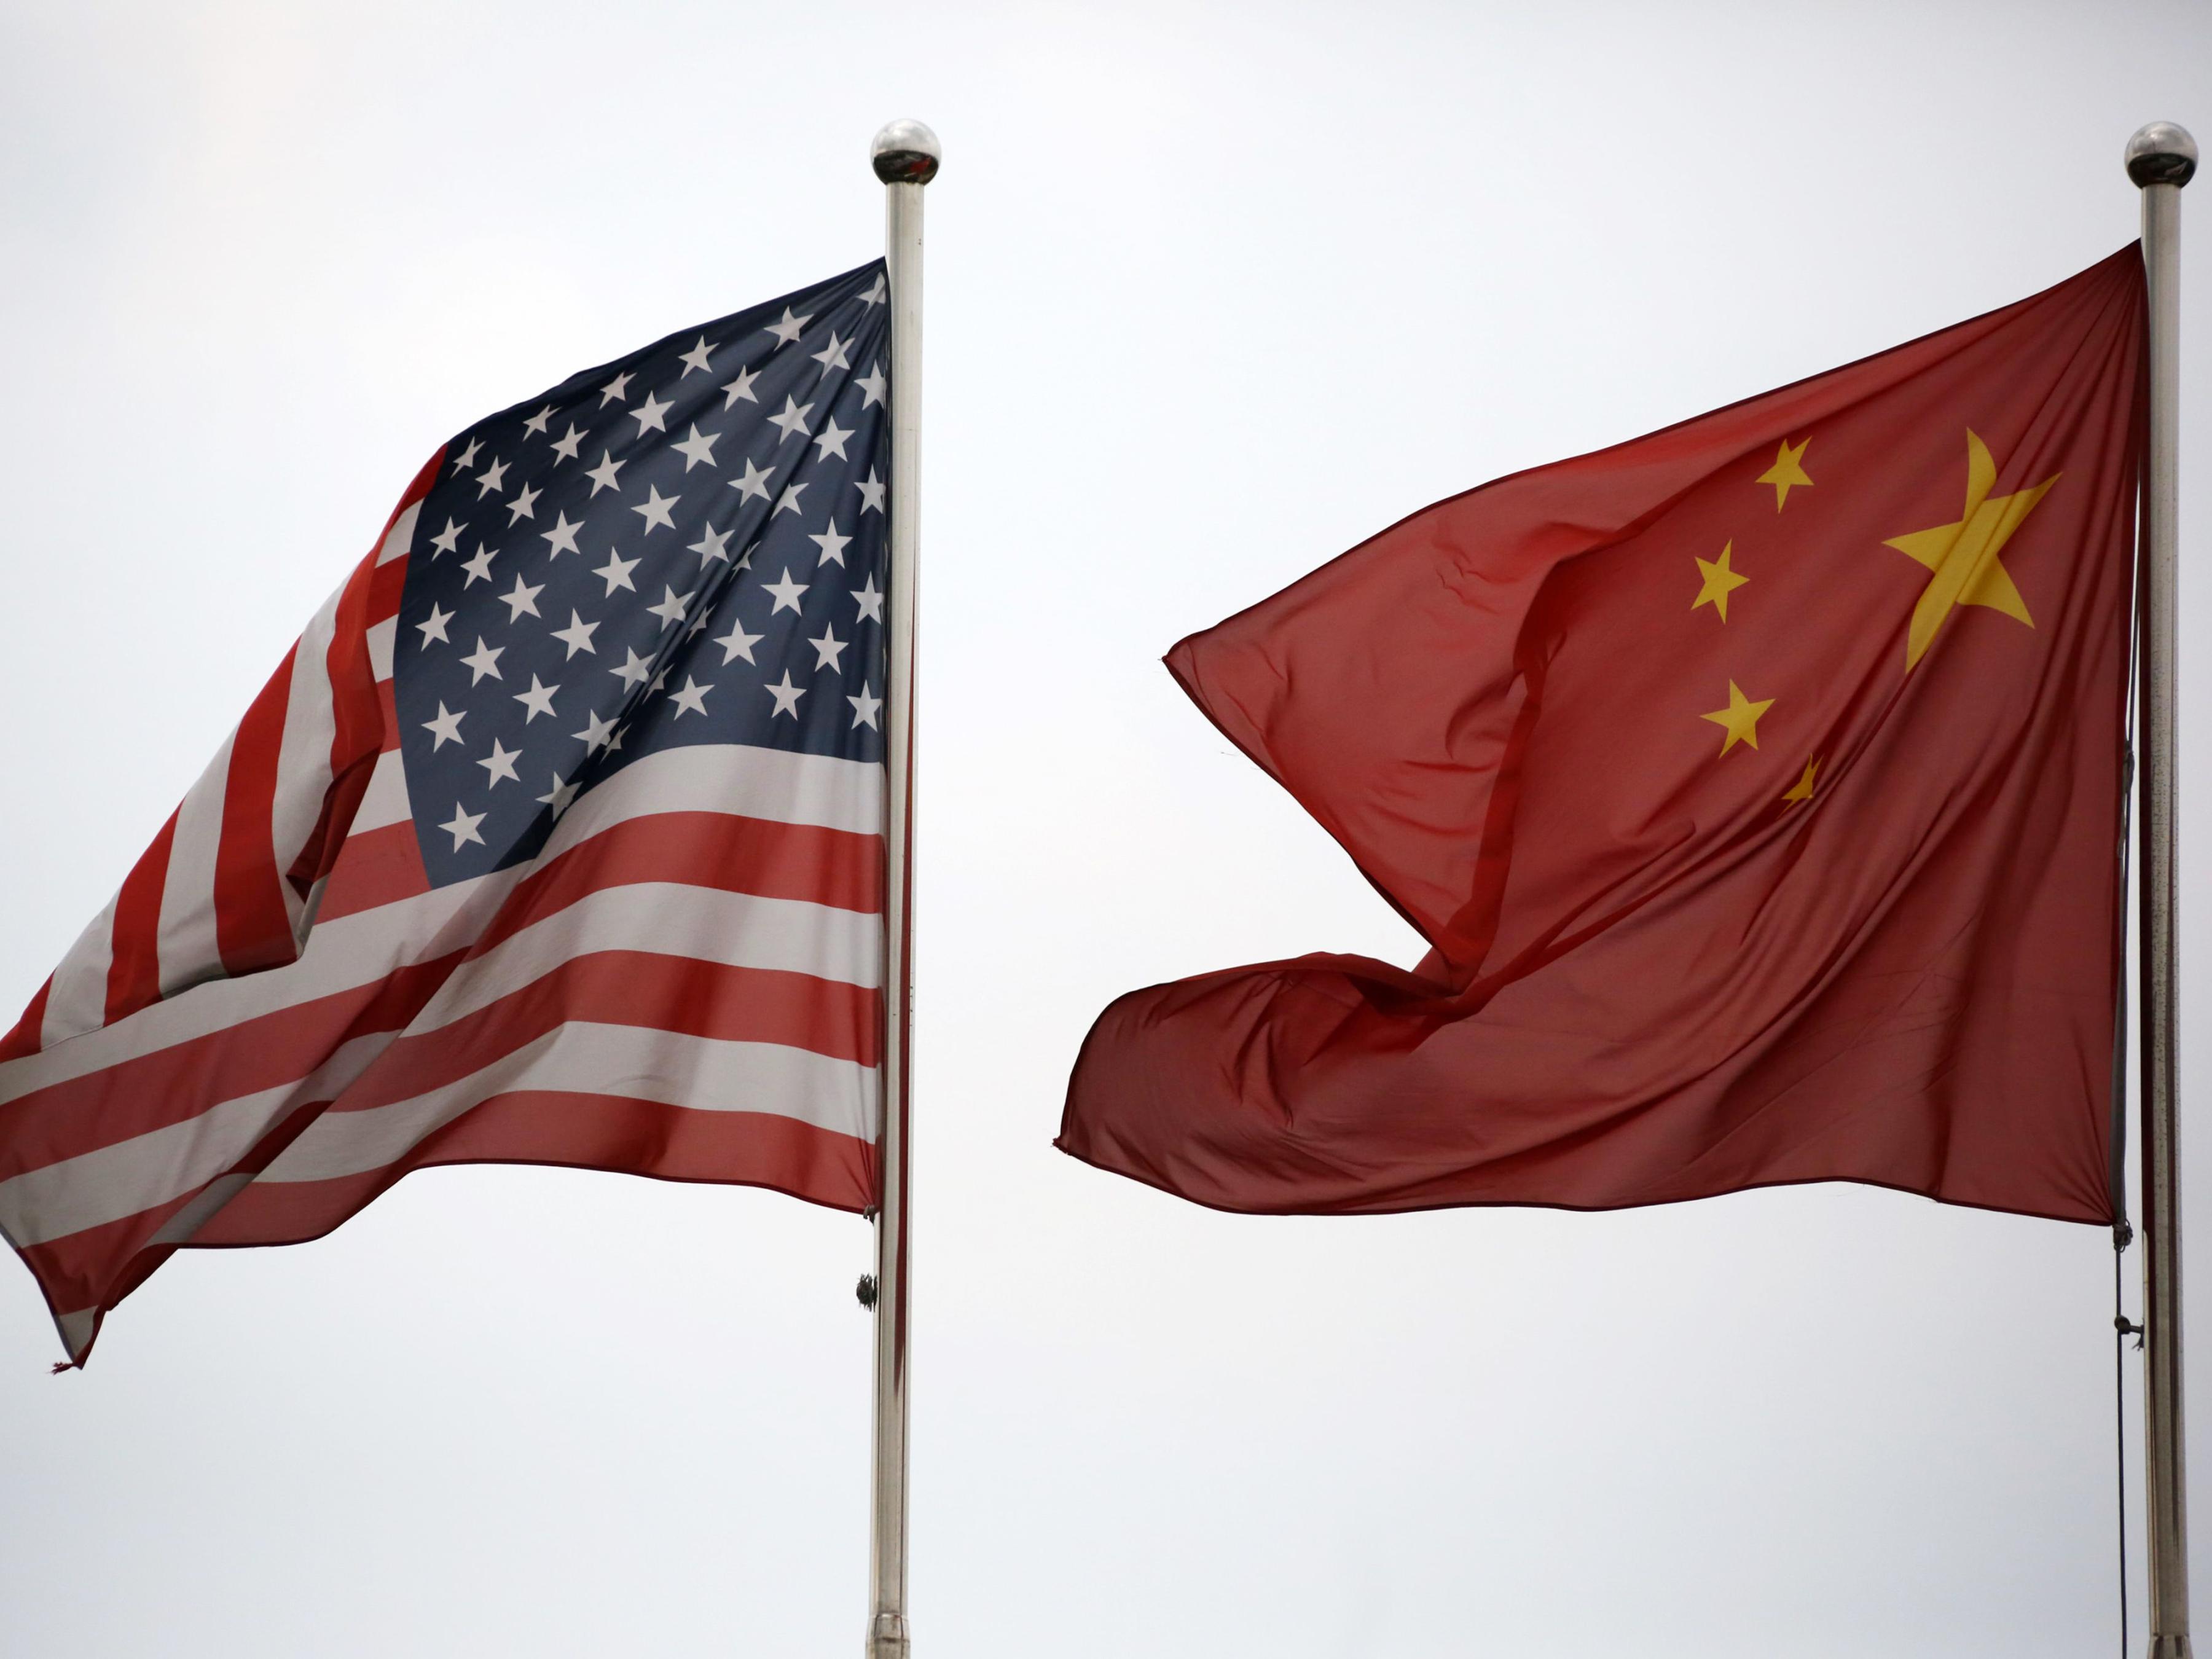 U.S. and China Trade